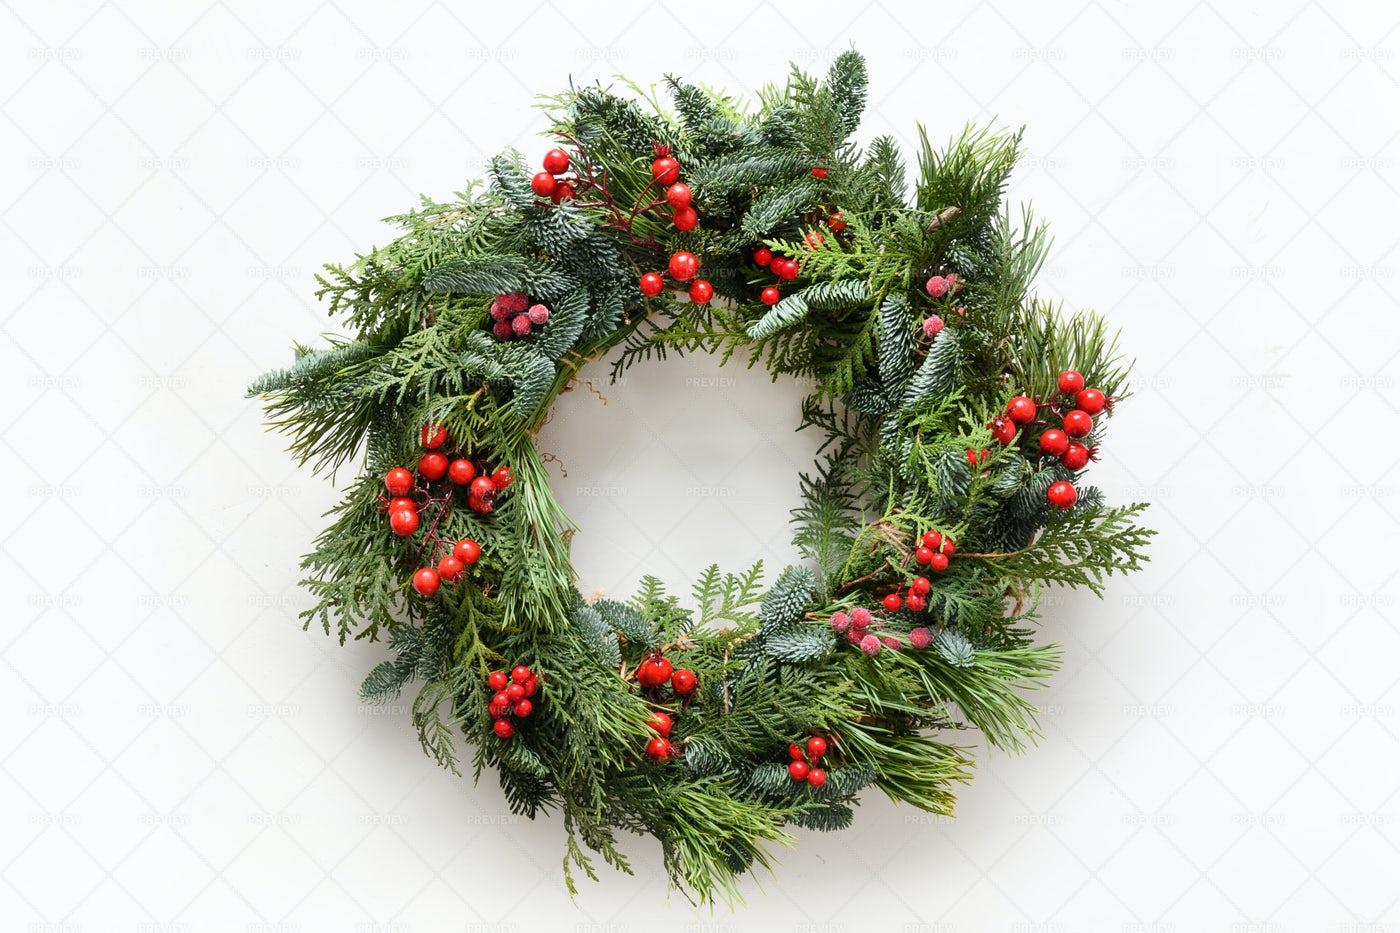 Festive Natural  Christmas Wreath: Stock Photos